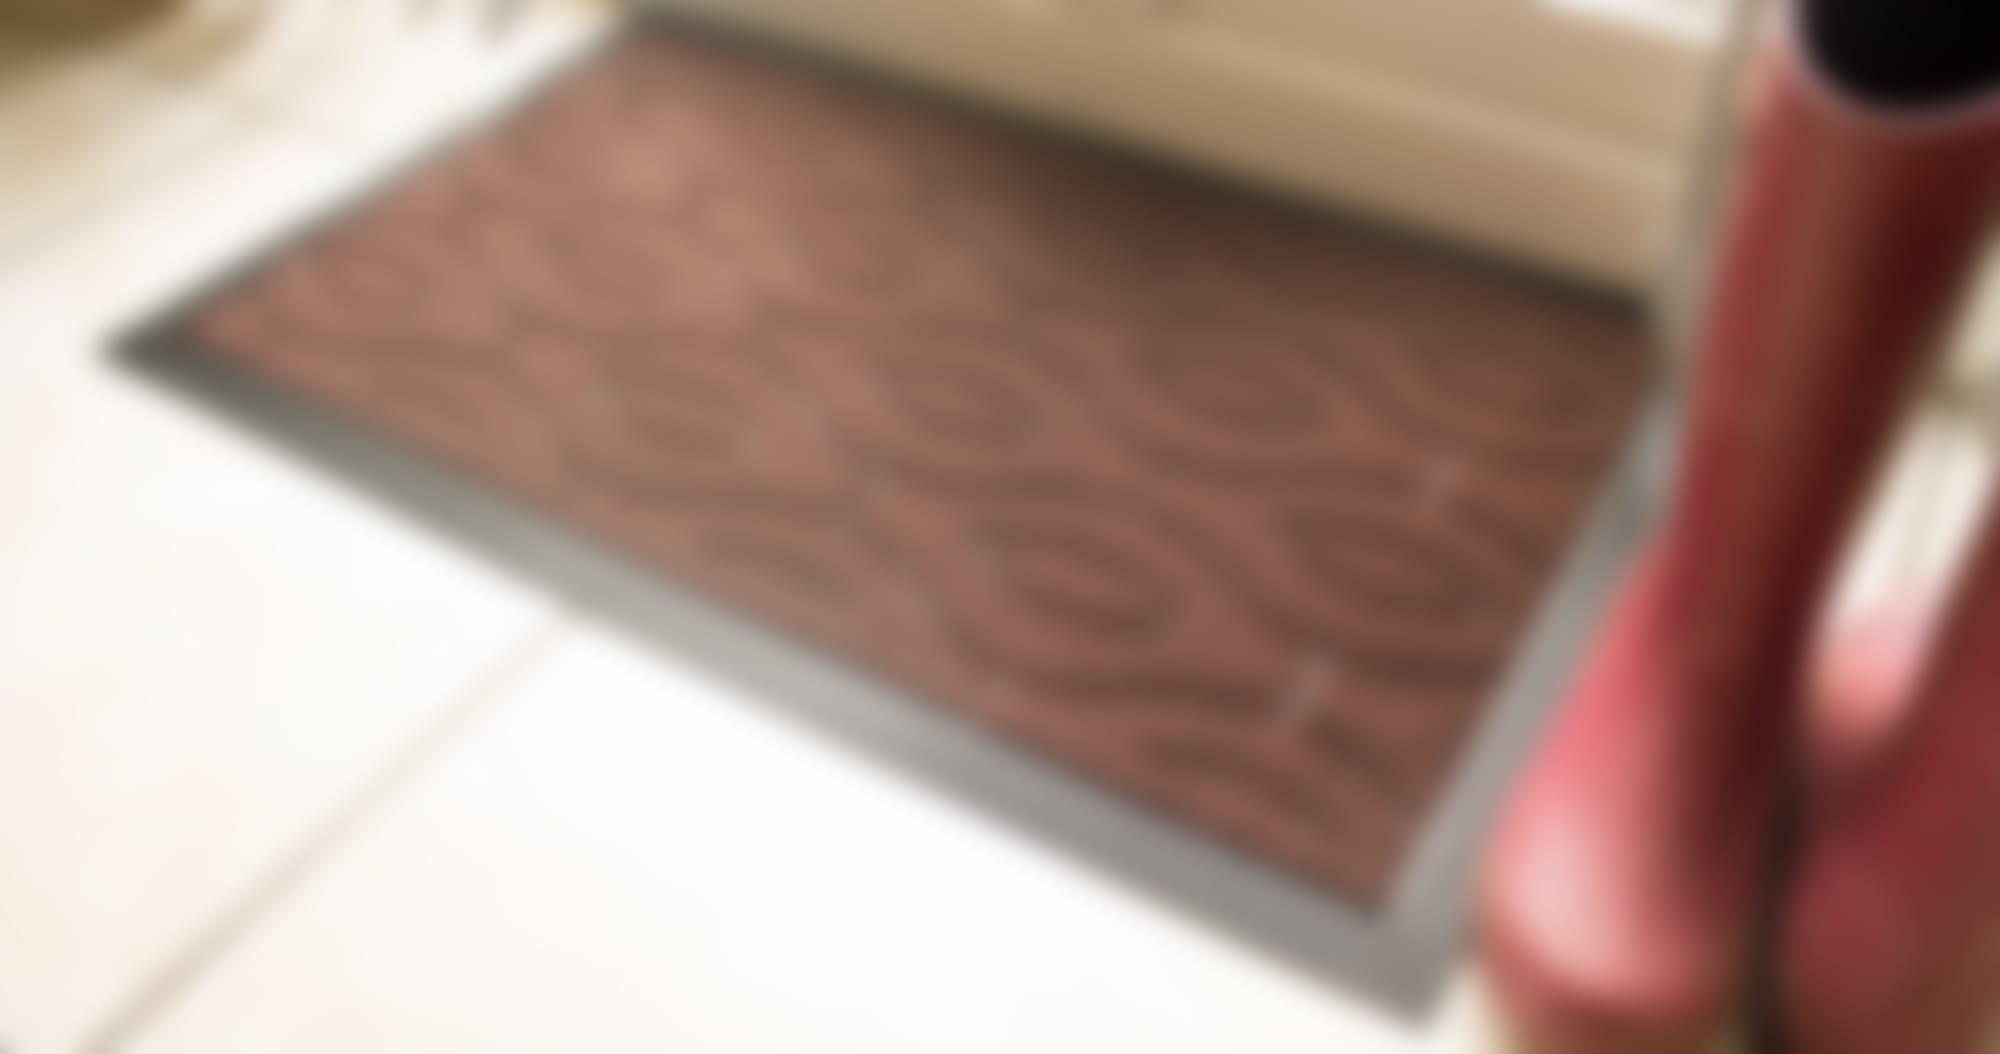 Rubber mats edenvale - Rubber Mats Edenvale 49